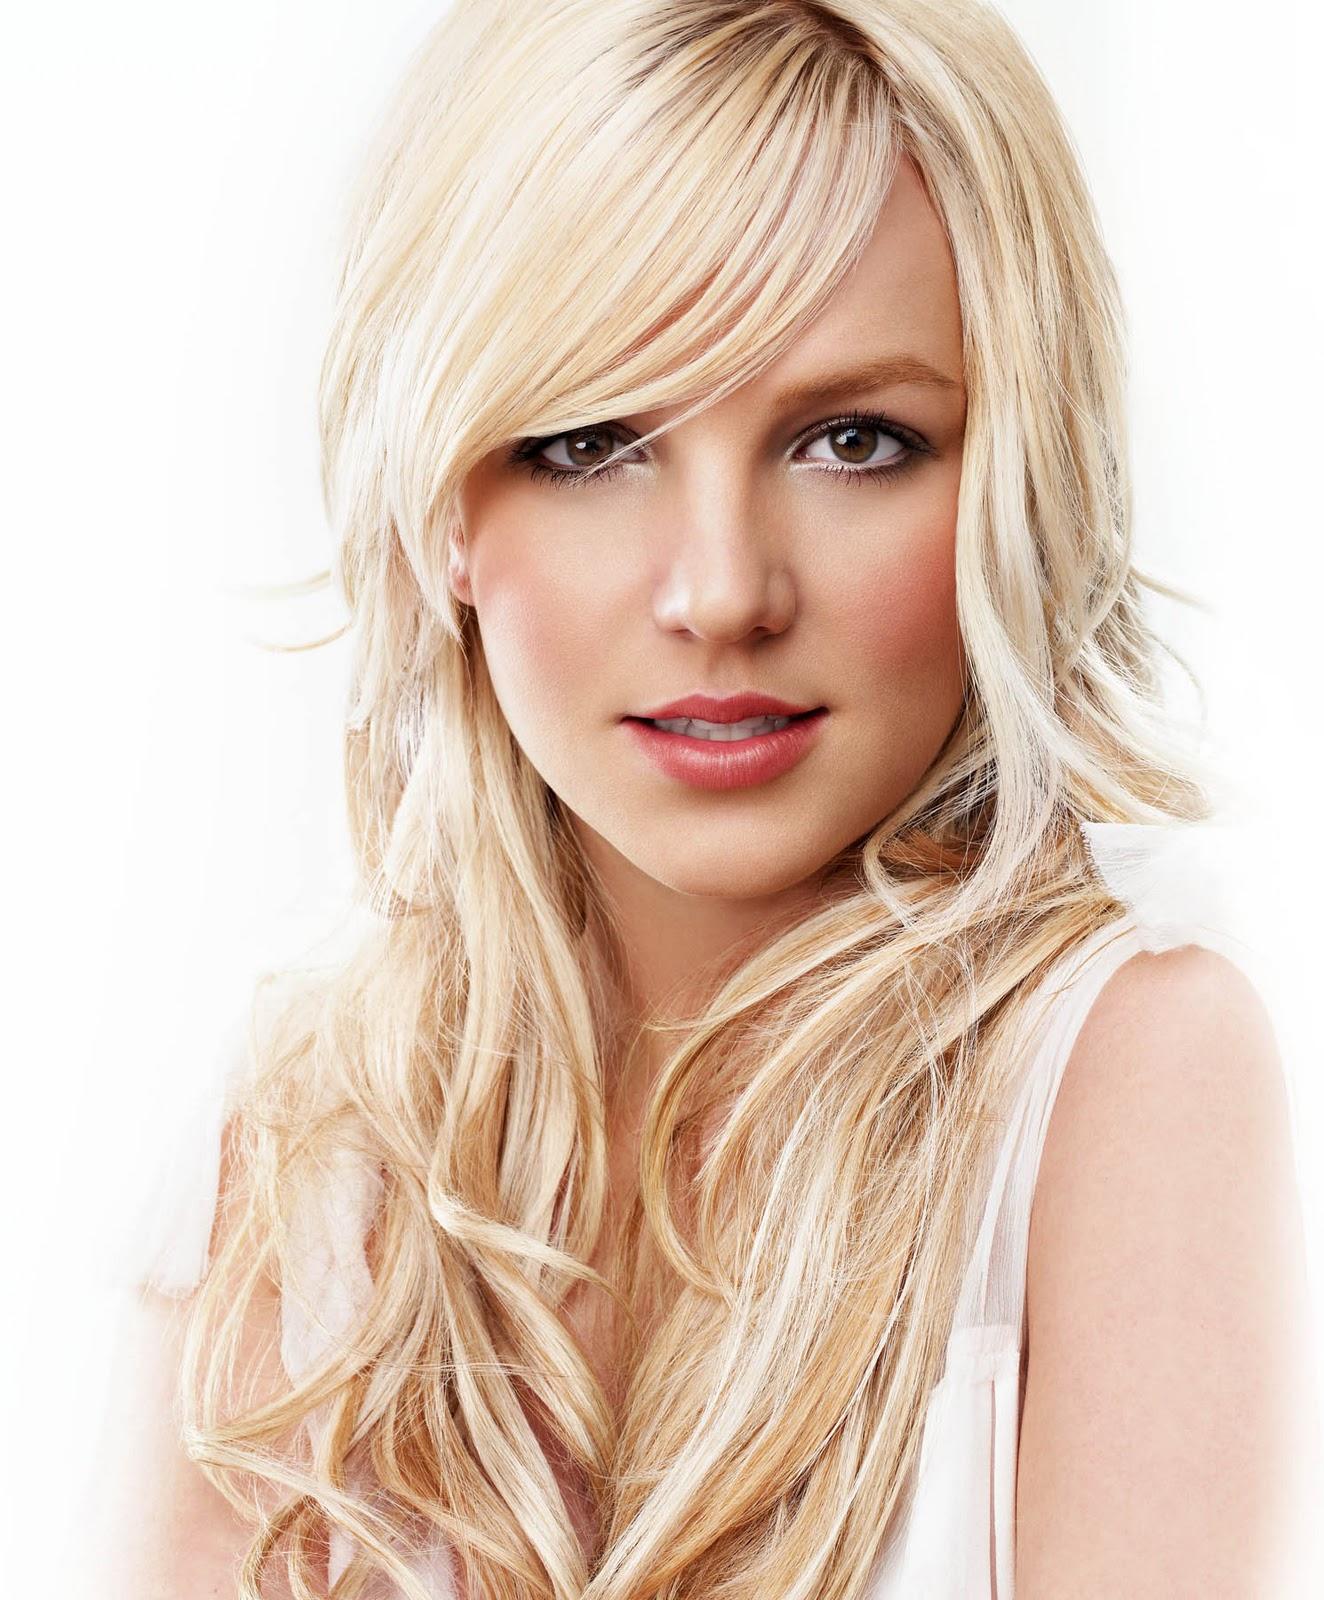 Girl+Hairstyles%2C+Photo+Gallery%2C+Britney+Spears+Hairstyles%2C ...